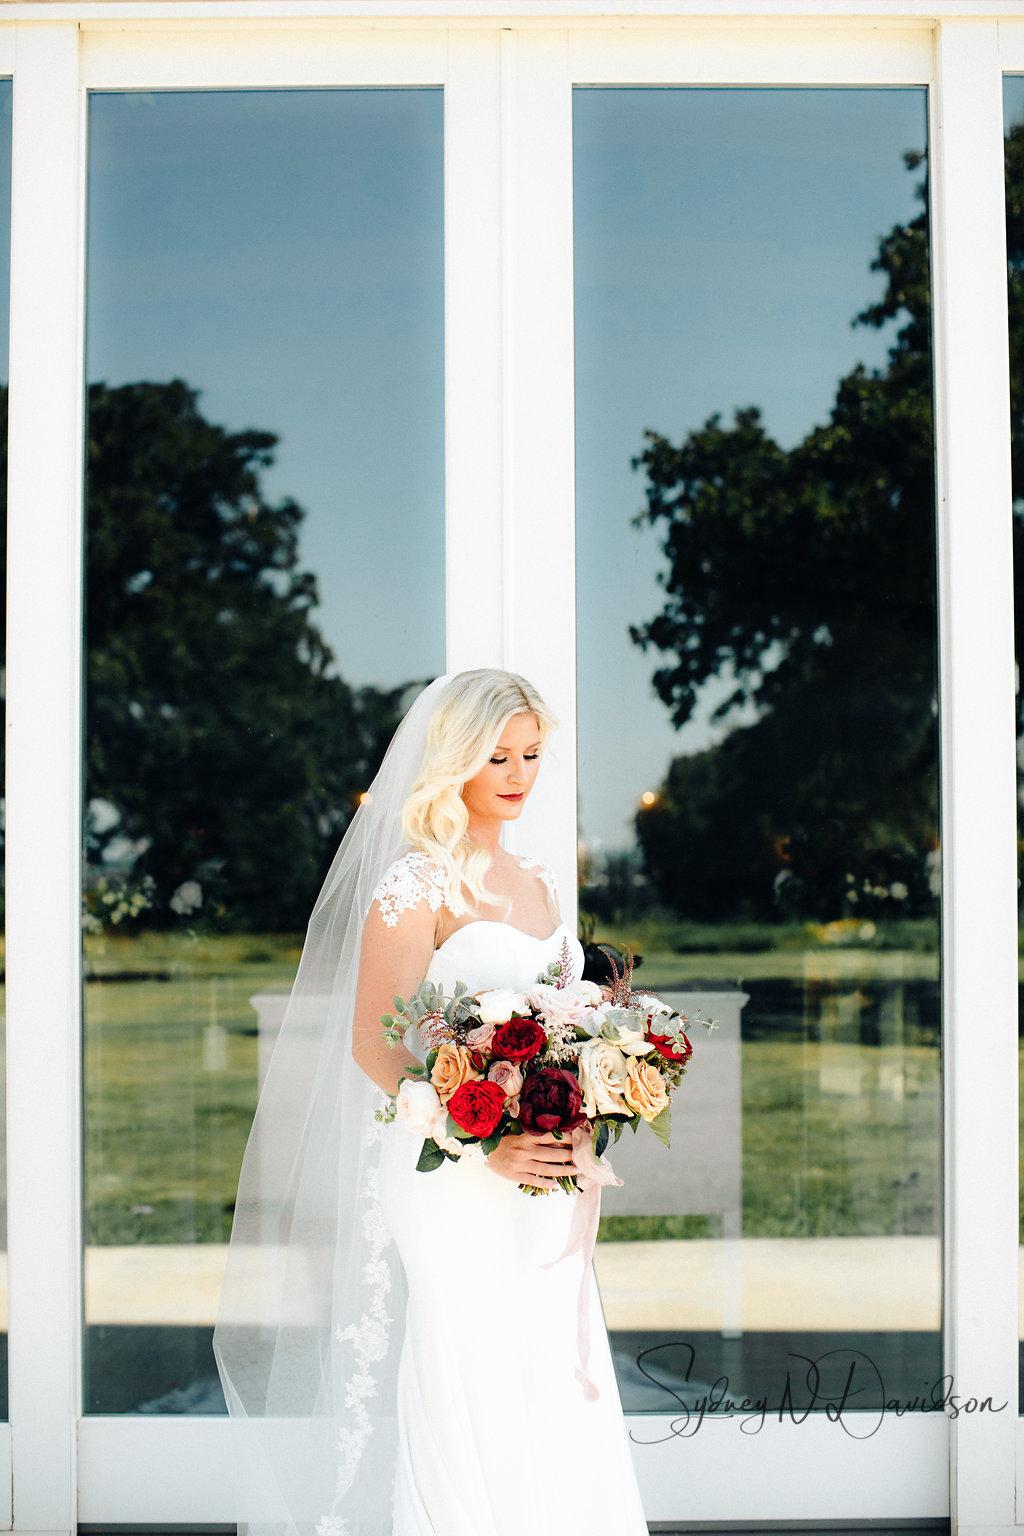 sydney-davidson-wedding-stillwater-oklahoma-wedding-session-traveling-photographer-portrait-tulsa-oklahoma-2477.jpg